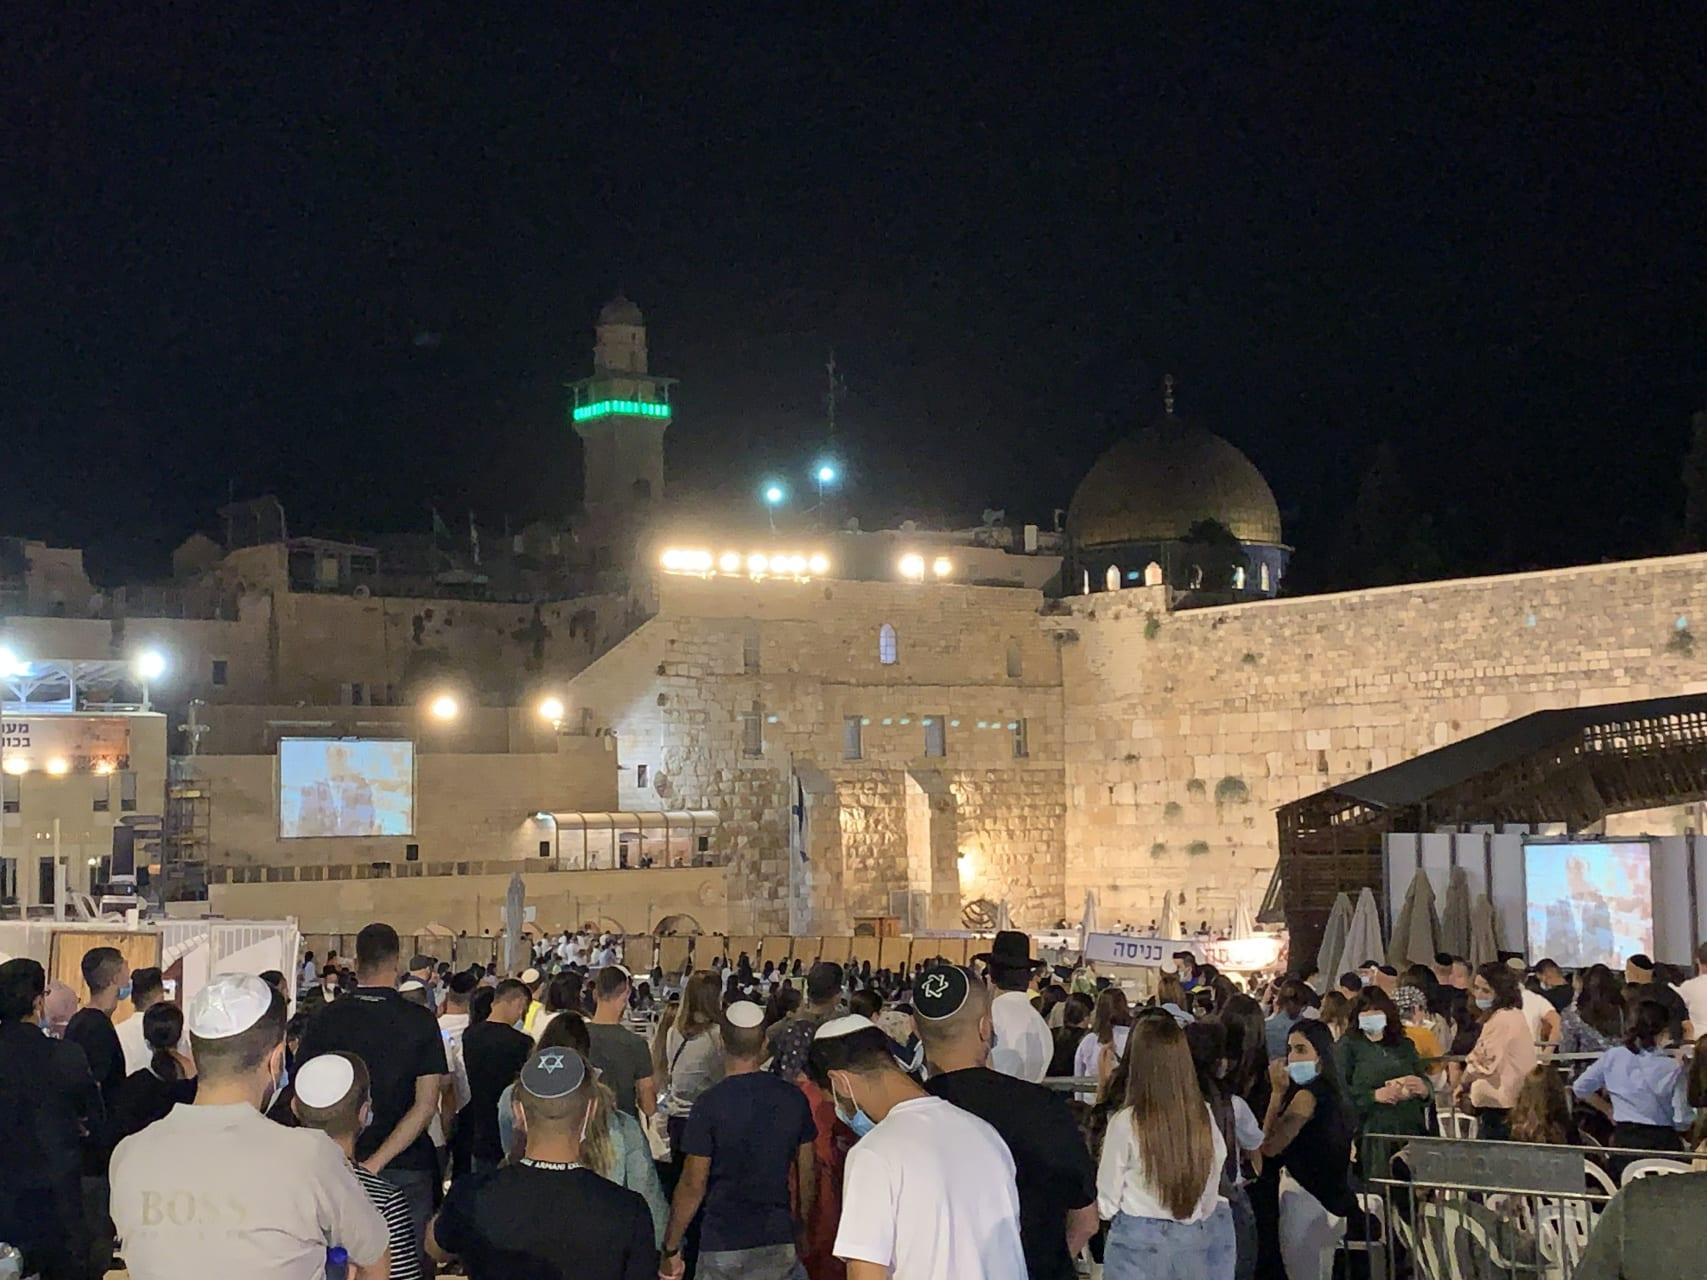 Jerusalem - Slichot - The Jewish Night Prayers